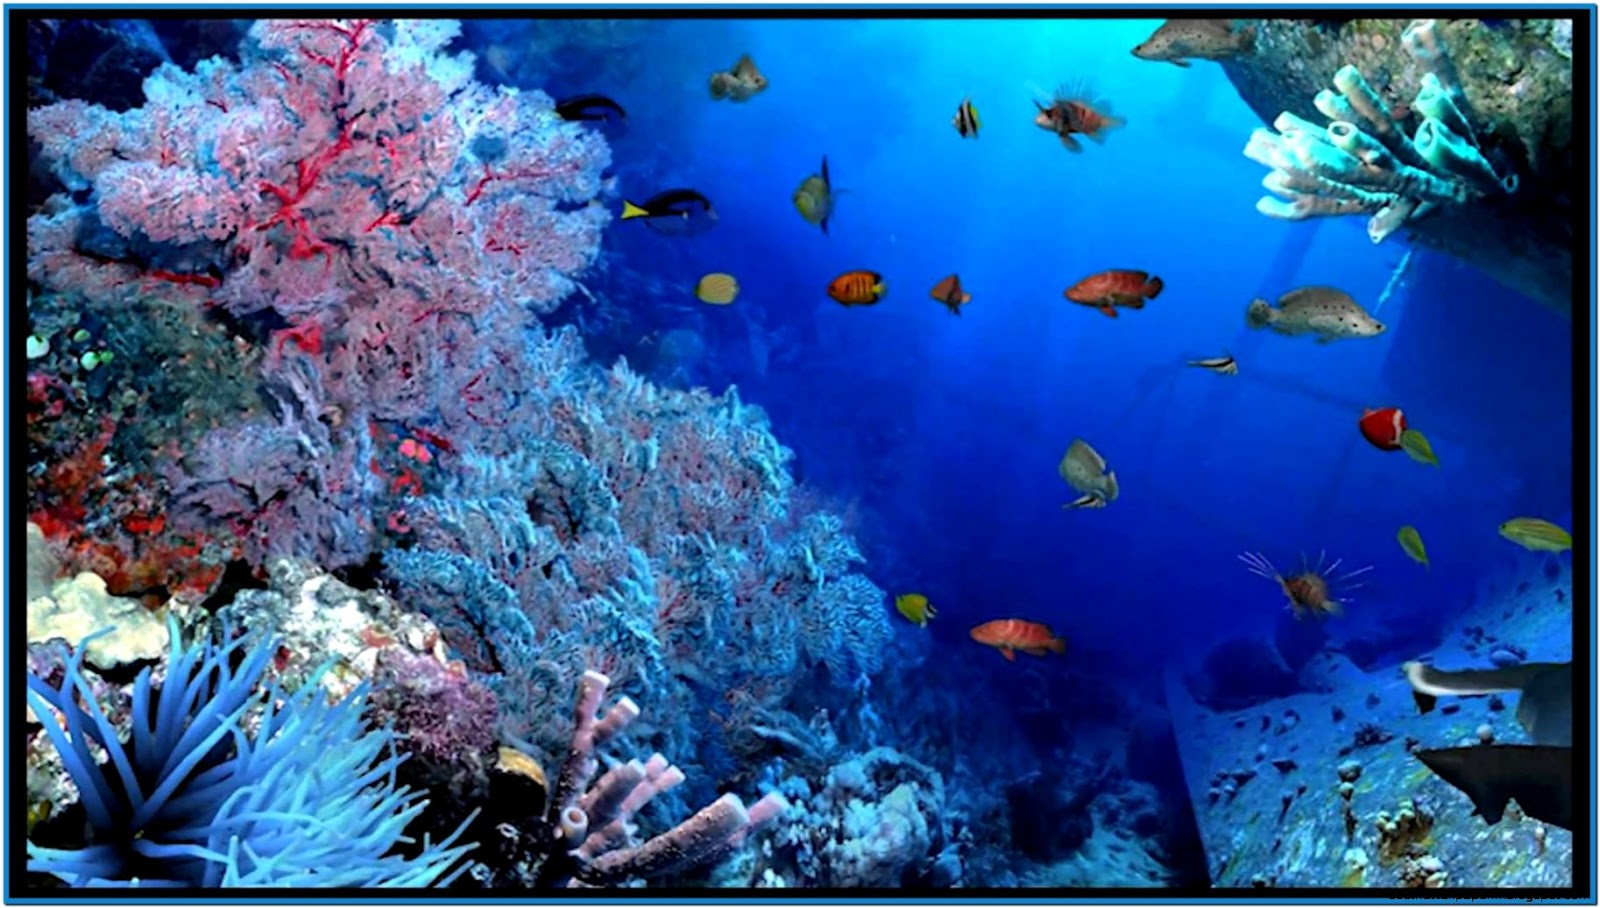 aquarium screensavers 3d wallpaper best hd wallpapers